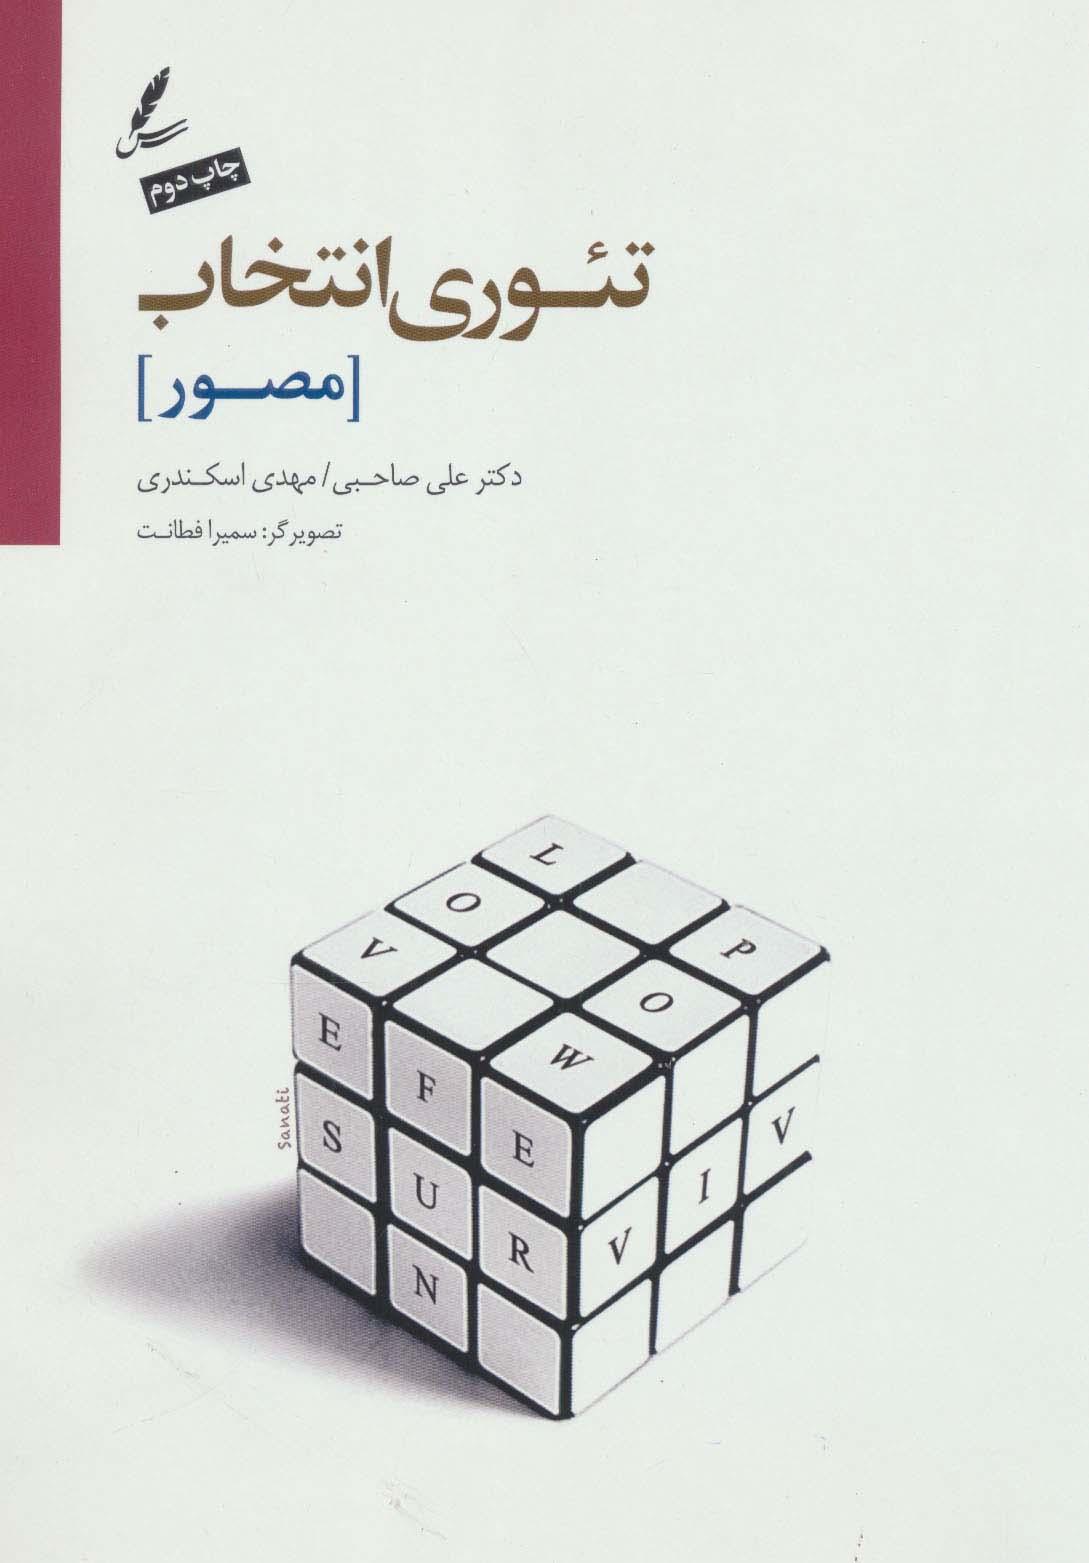 تئوری انتخاب (مصور)